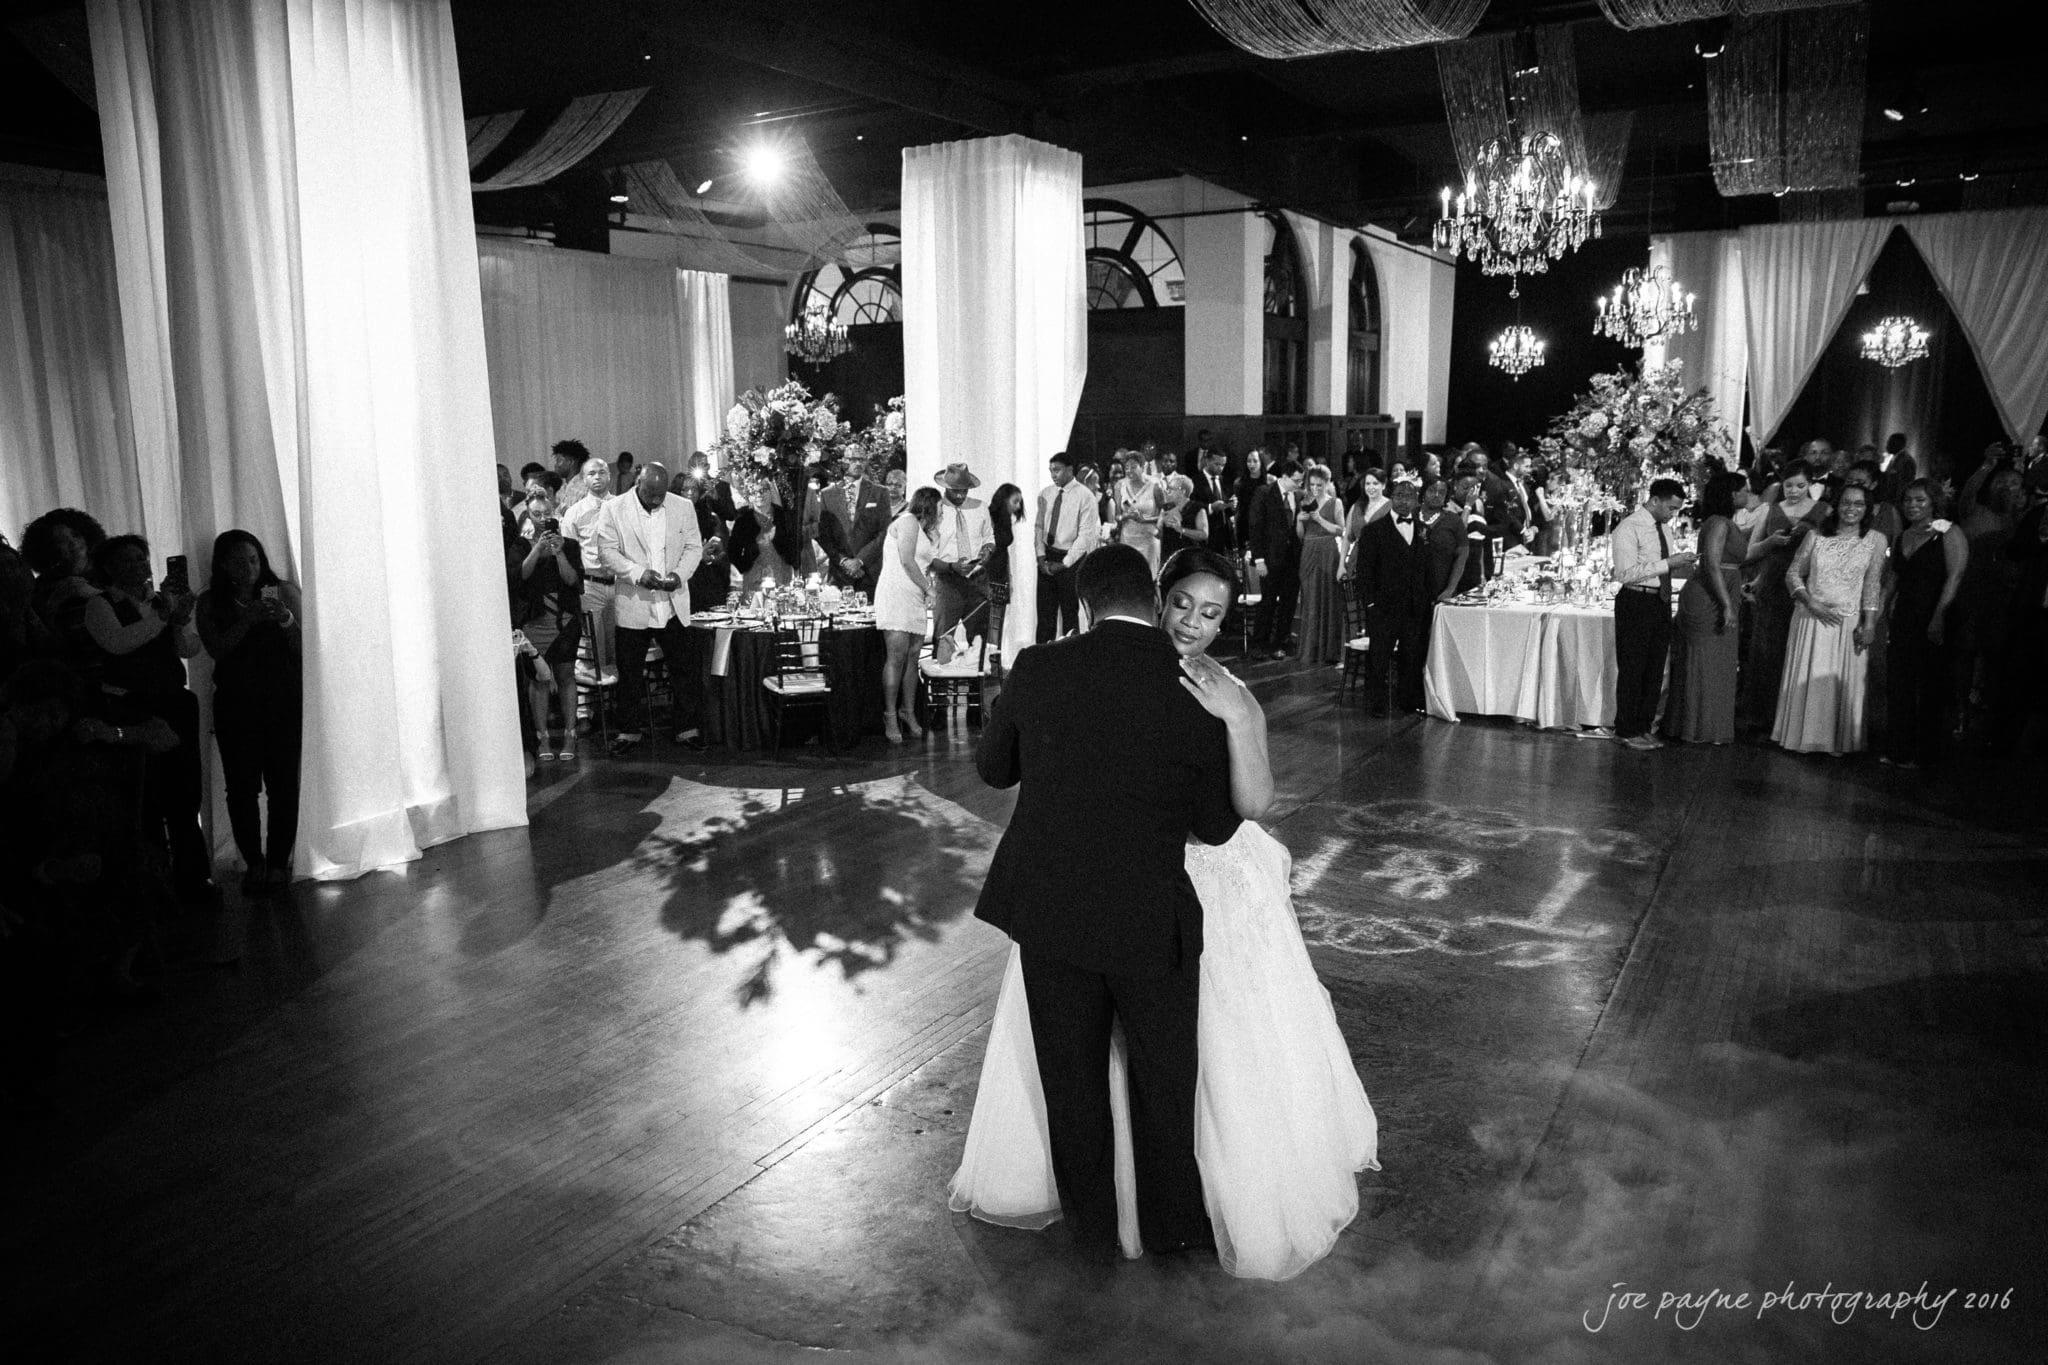 first-baptist-millennium-center-winston-salem-wedding-photography-toni-kevin-41